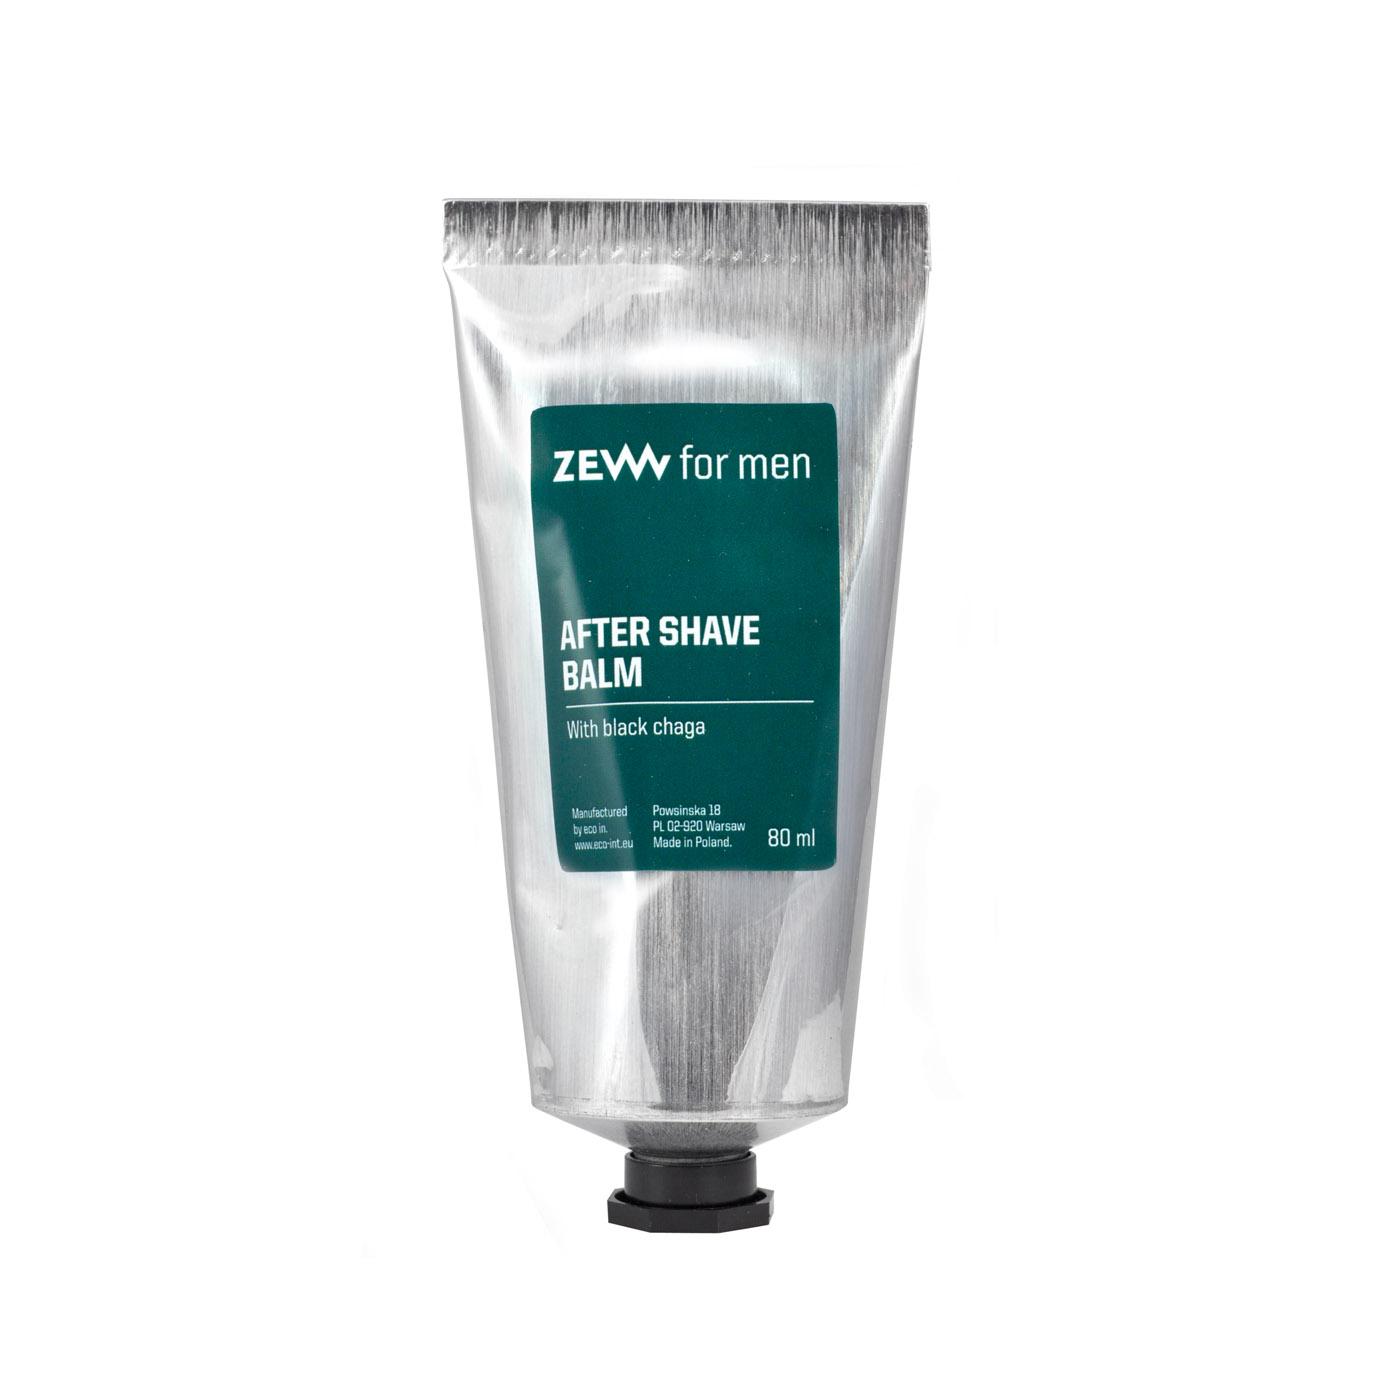 ZEW for men After Shave Balm - balzám po holení s hubou chaga, 80 ml